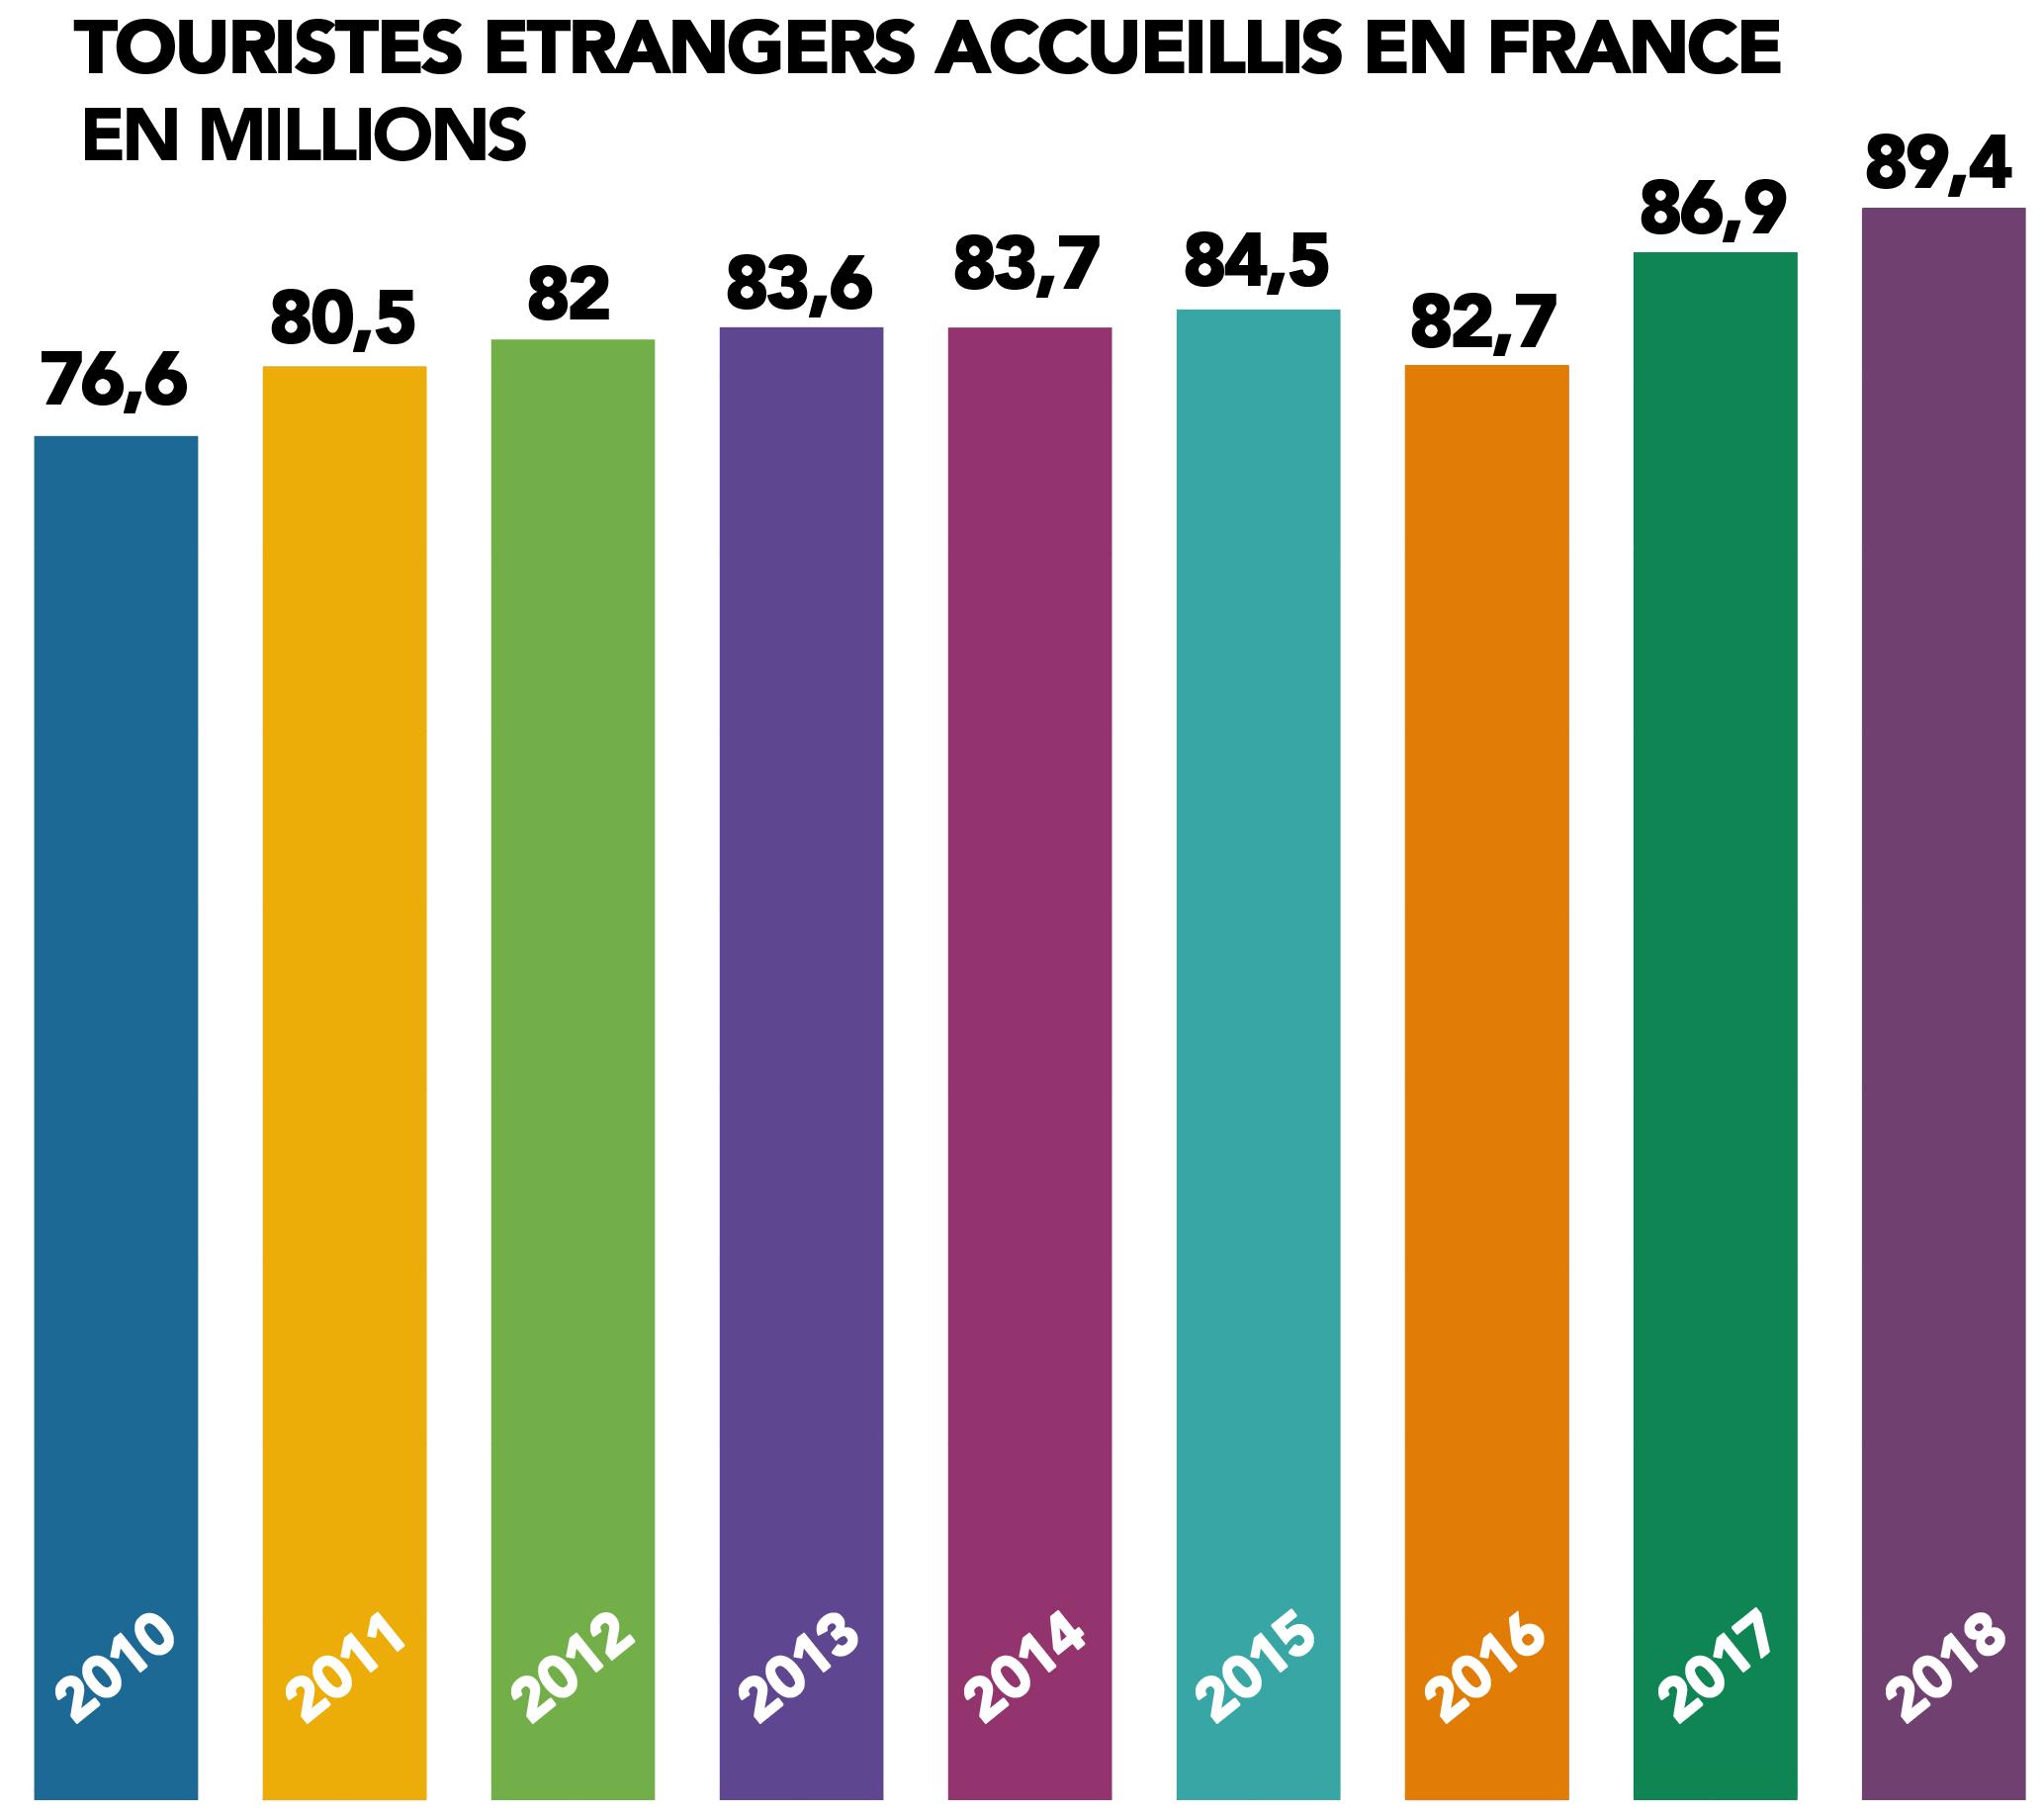 Touristes-e-trangers-accueillis-en-France